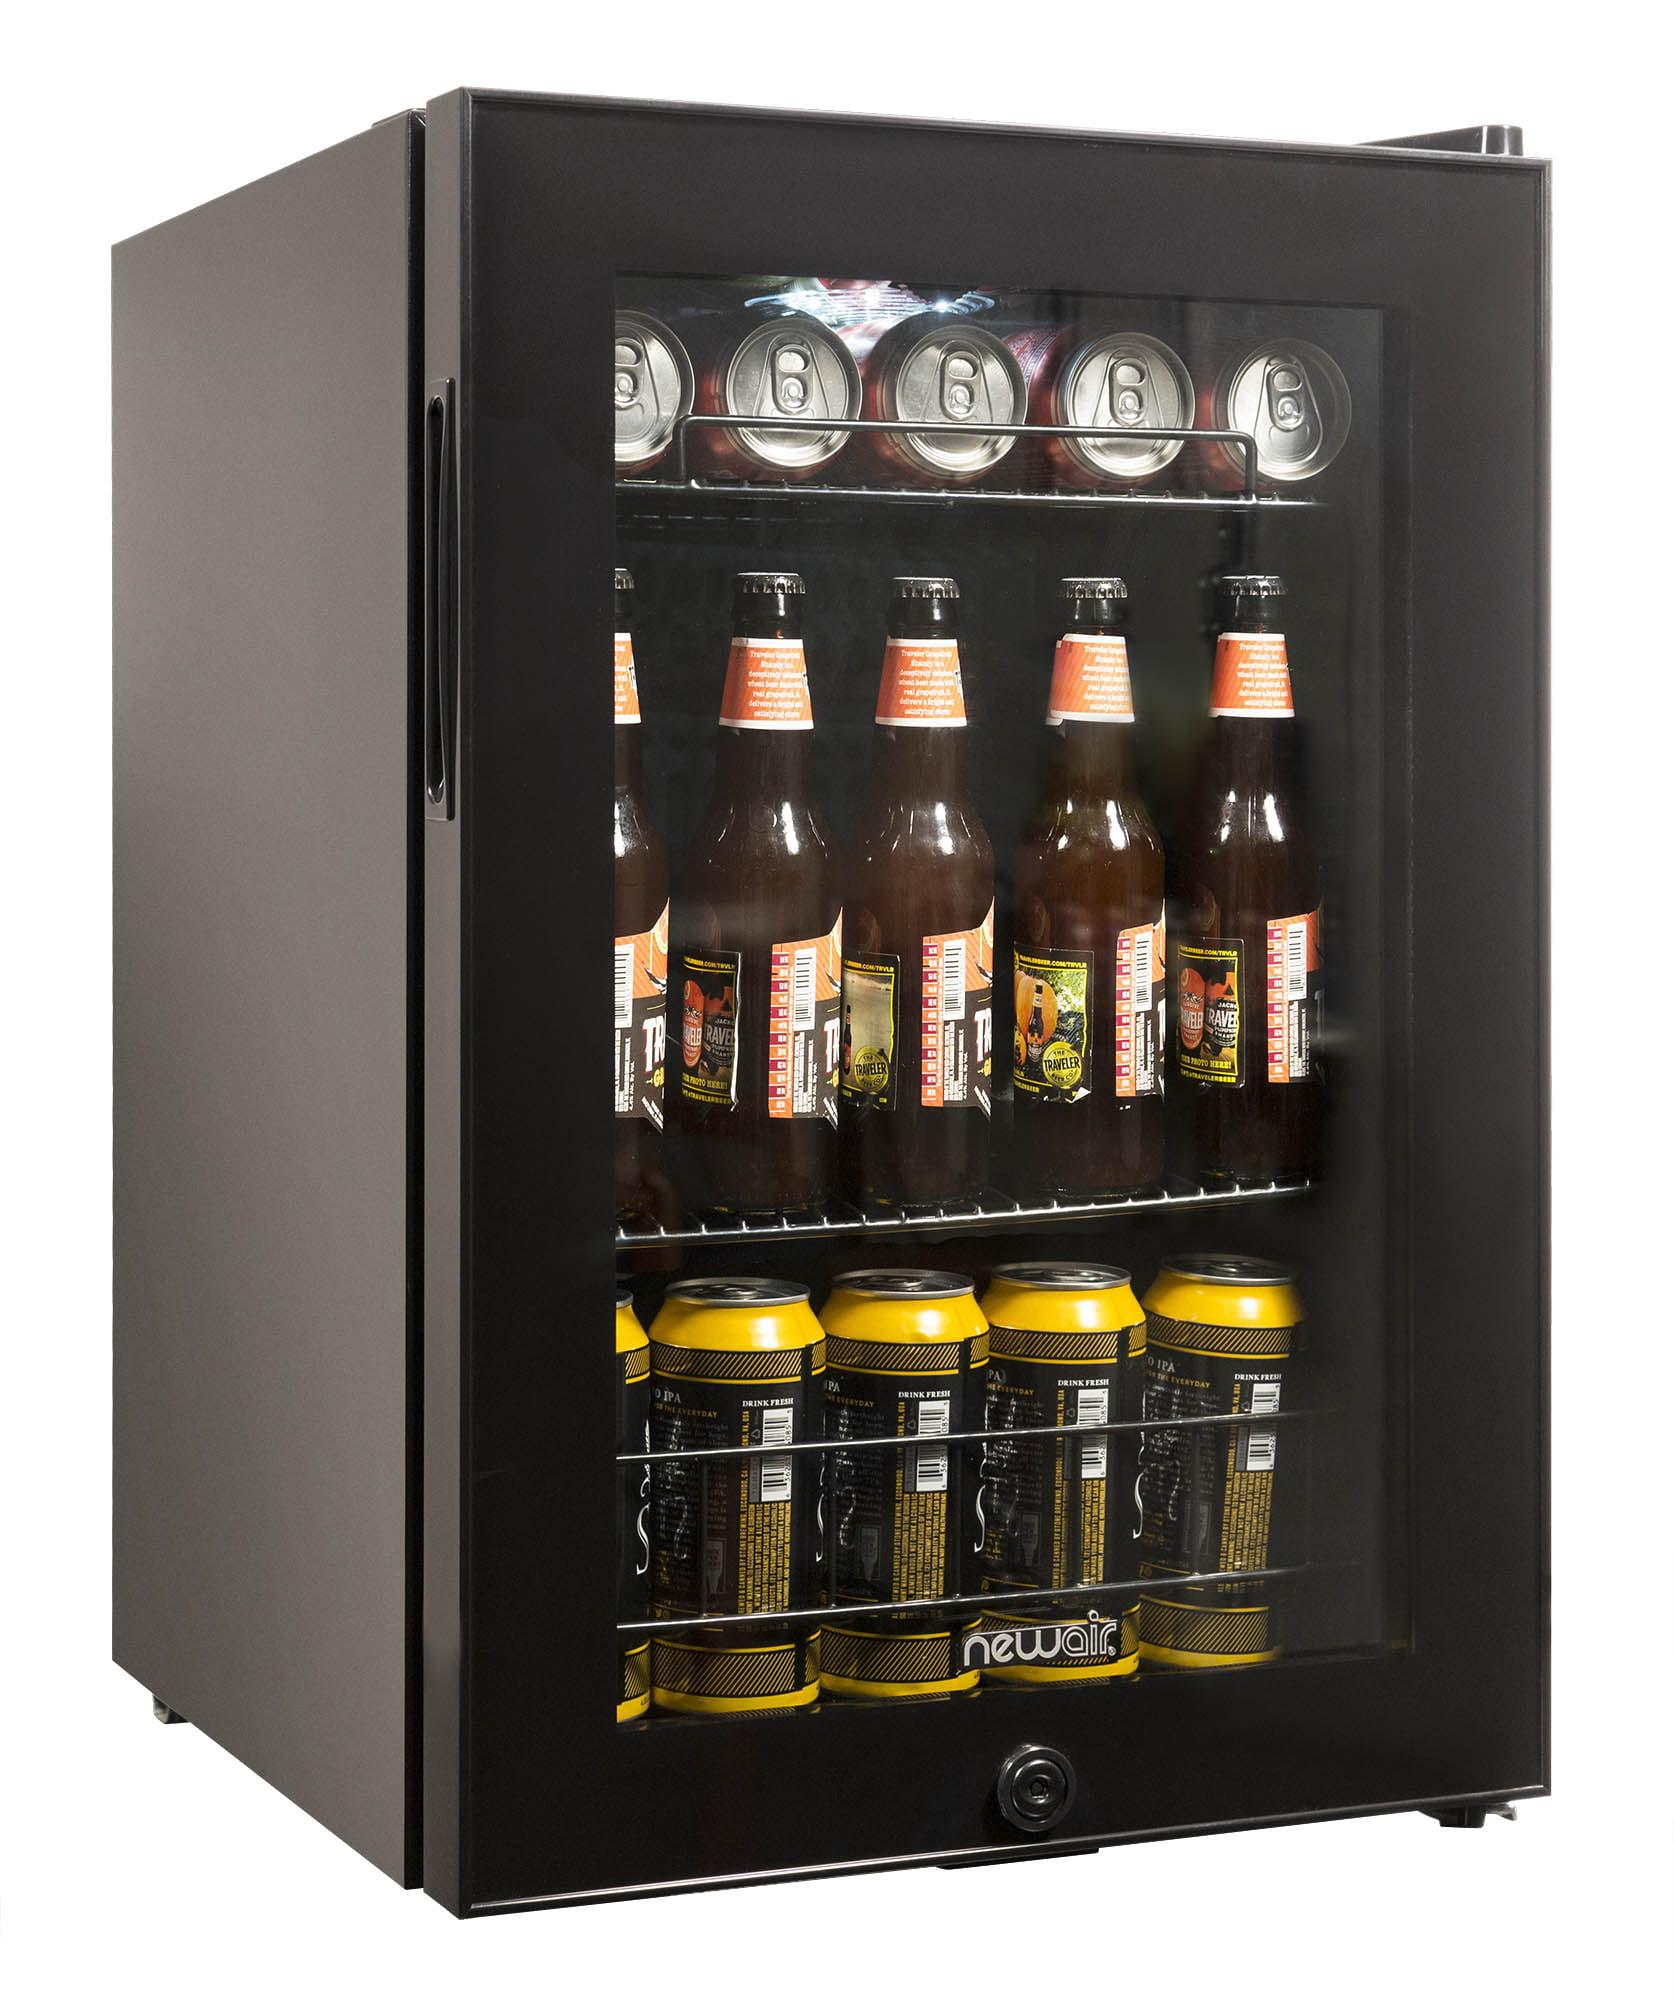 Newair Ab 850b Beverage Cooler And Refrigerator Small Mini Fridge With Glass Door Black Walmart Com Walmart Com